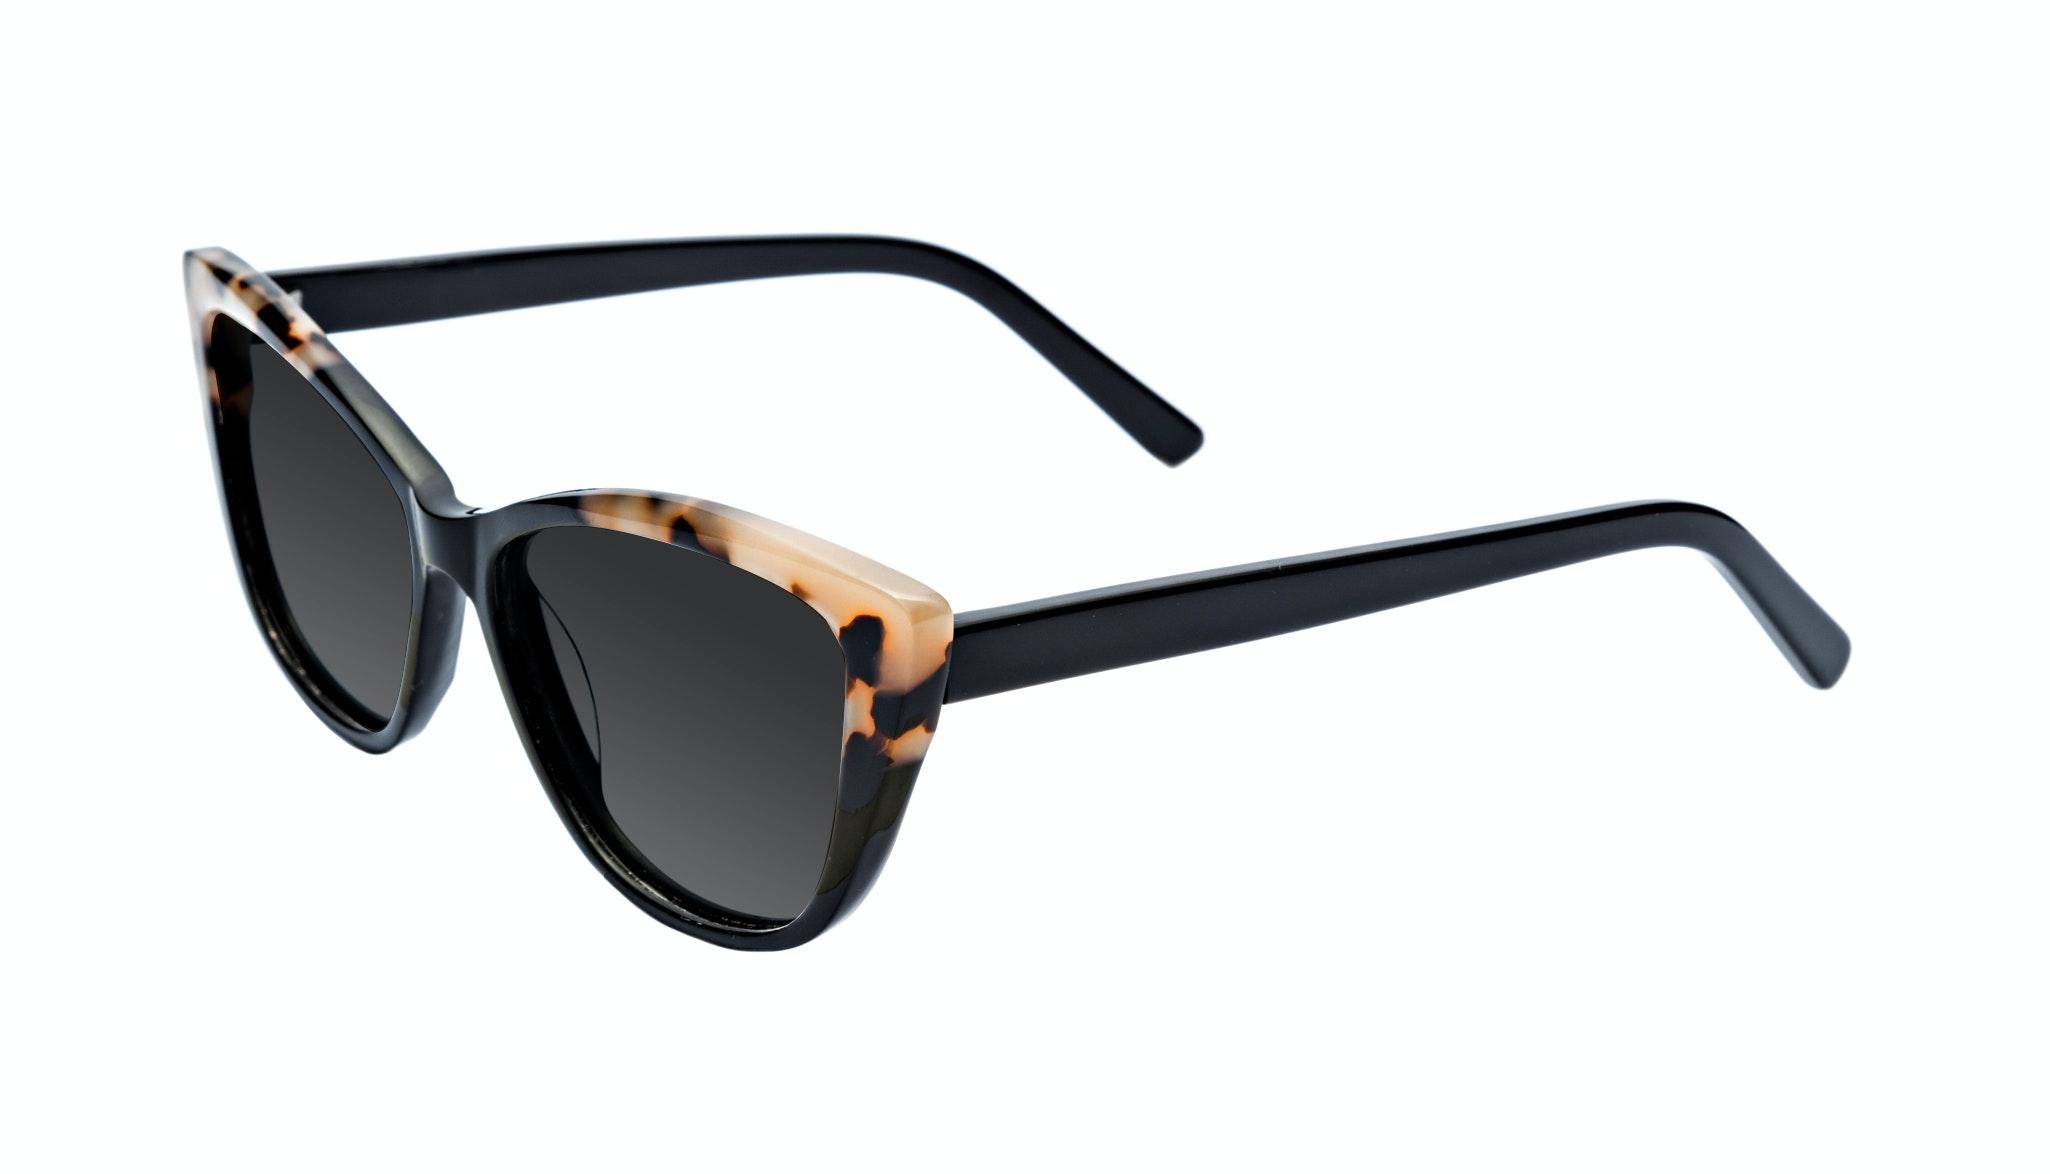 Affordable Fashion Glasses Cat Eye Daring Cateye Sunglasses Women Dolled Up Ebony Granite Tilt